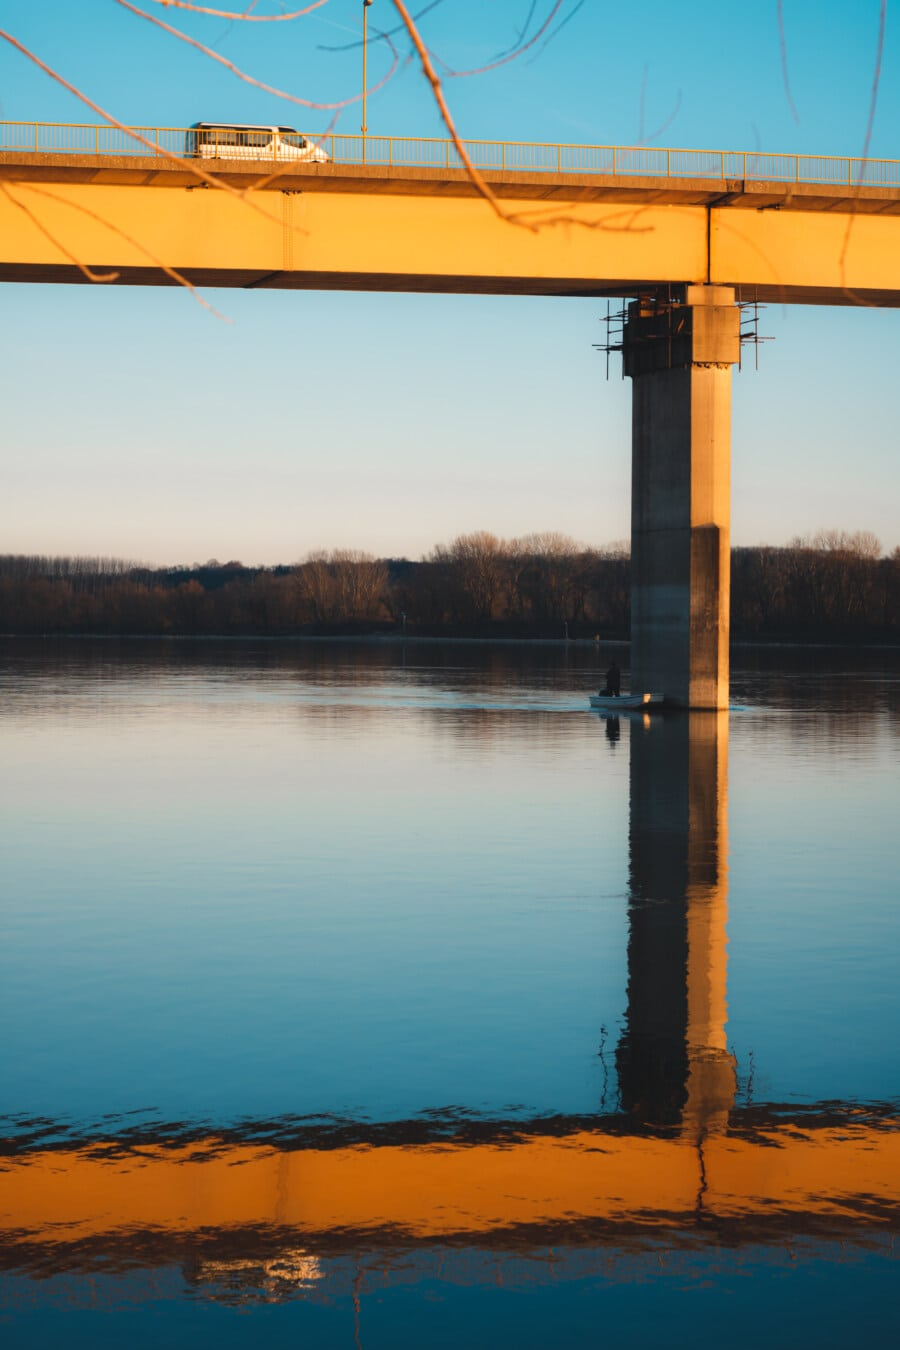 Angelboot/Fischerboot, darunter, Brücke, Wasser, See, Sonnenuntergang, Dämmerung, im freien, Fluss, Reflexion